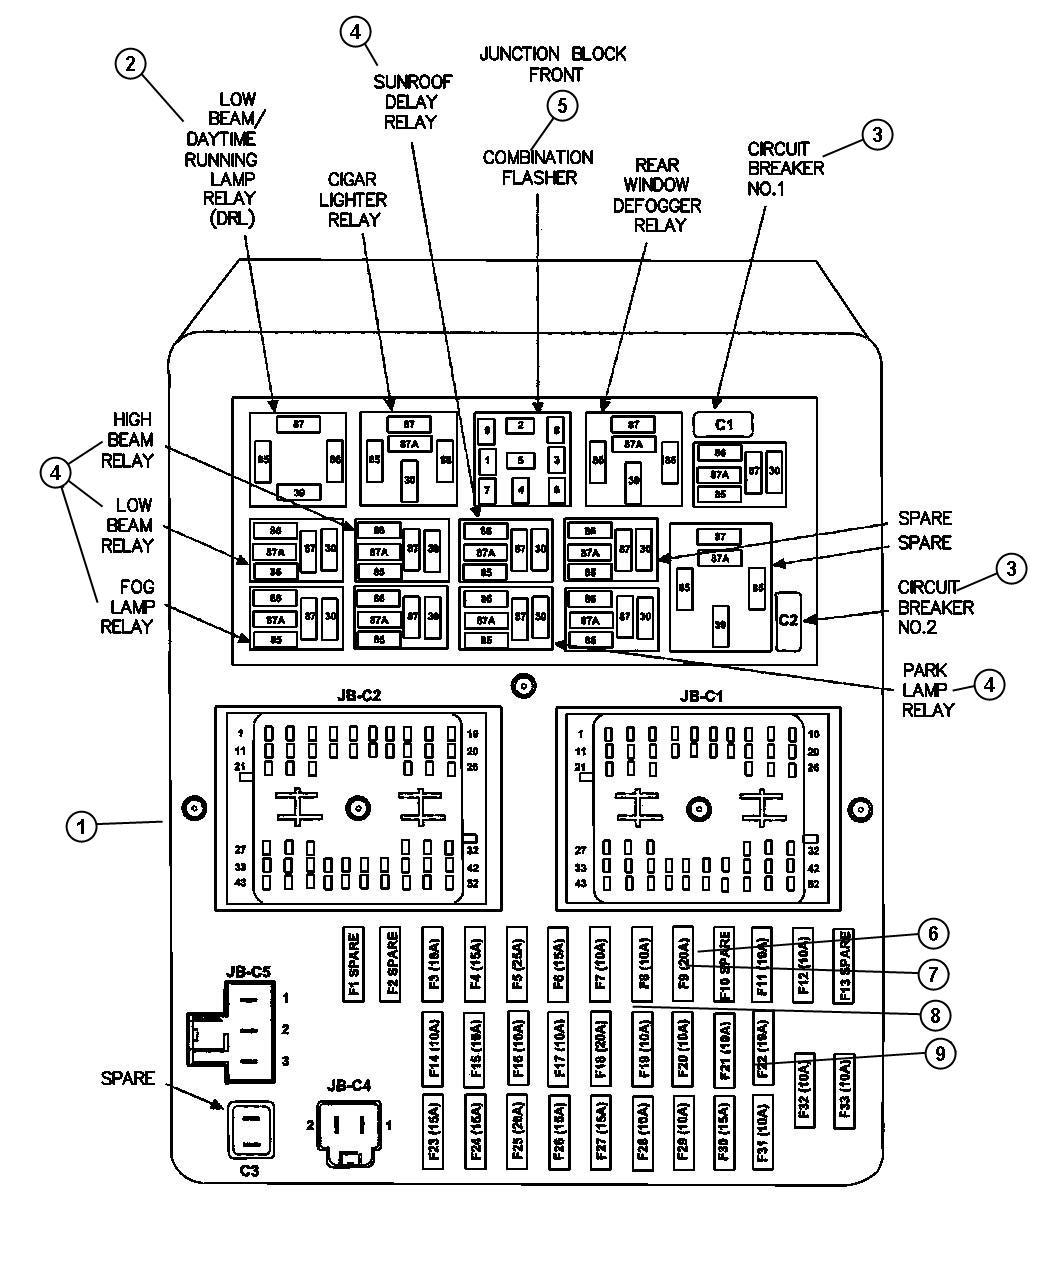 Jeep Grand Cherokee Breaker Circuit Power Seat Power